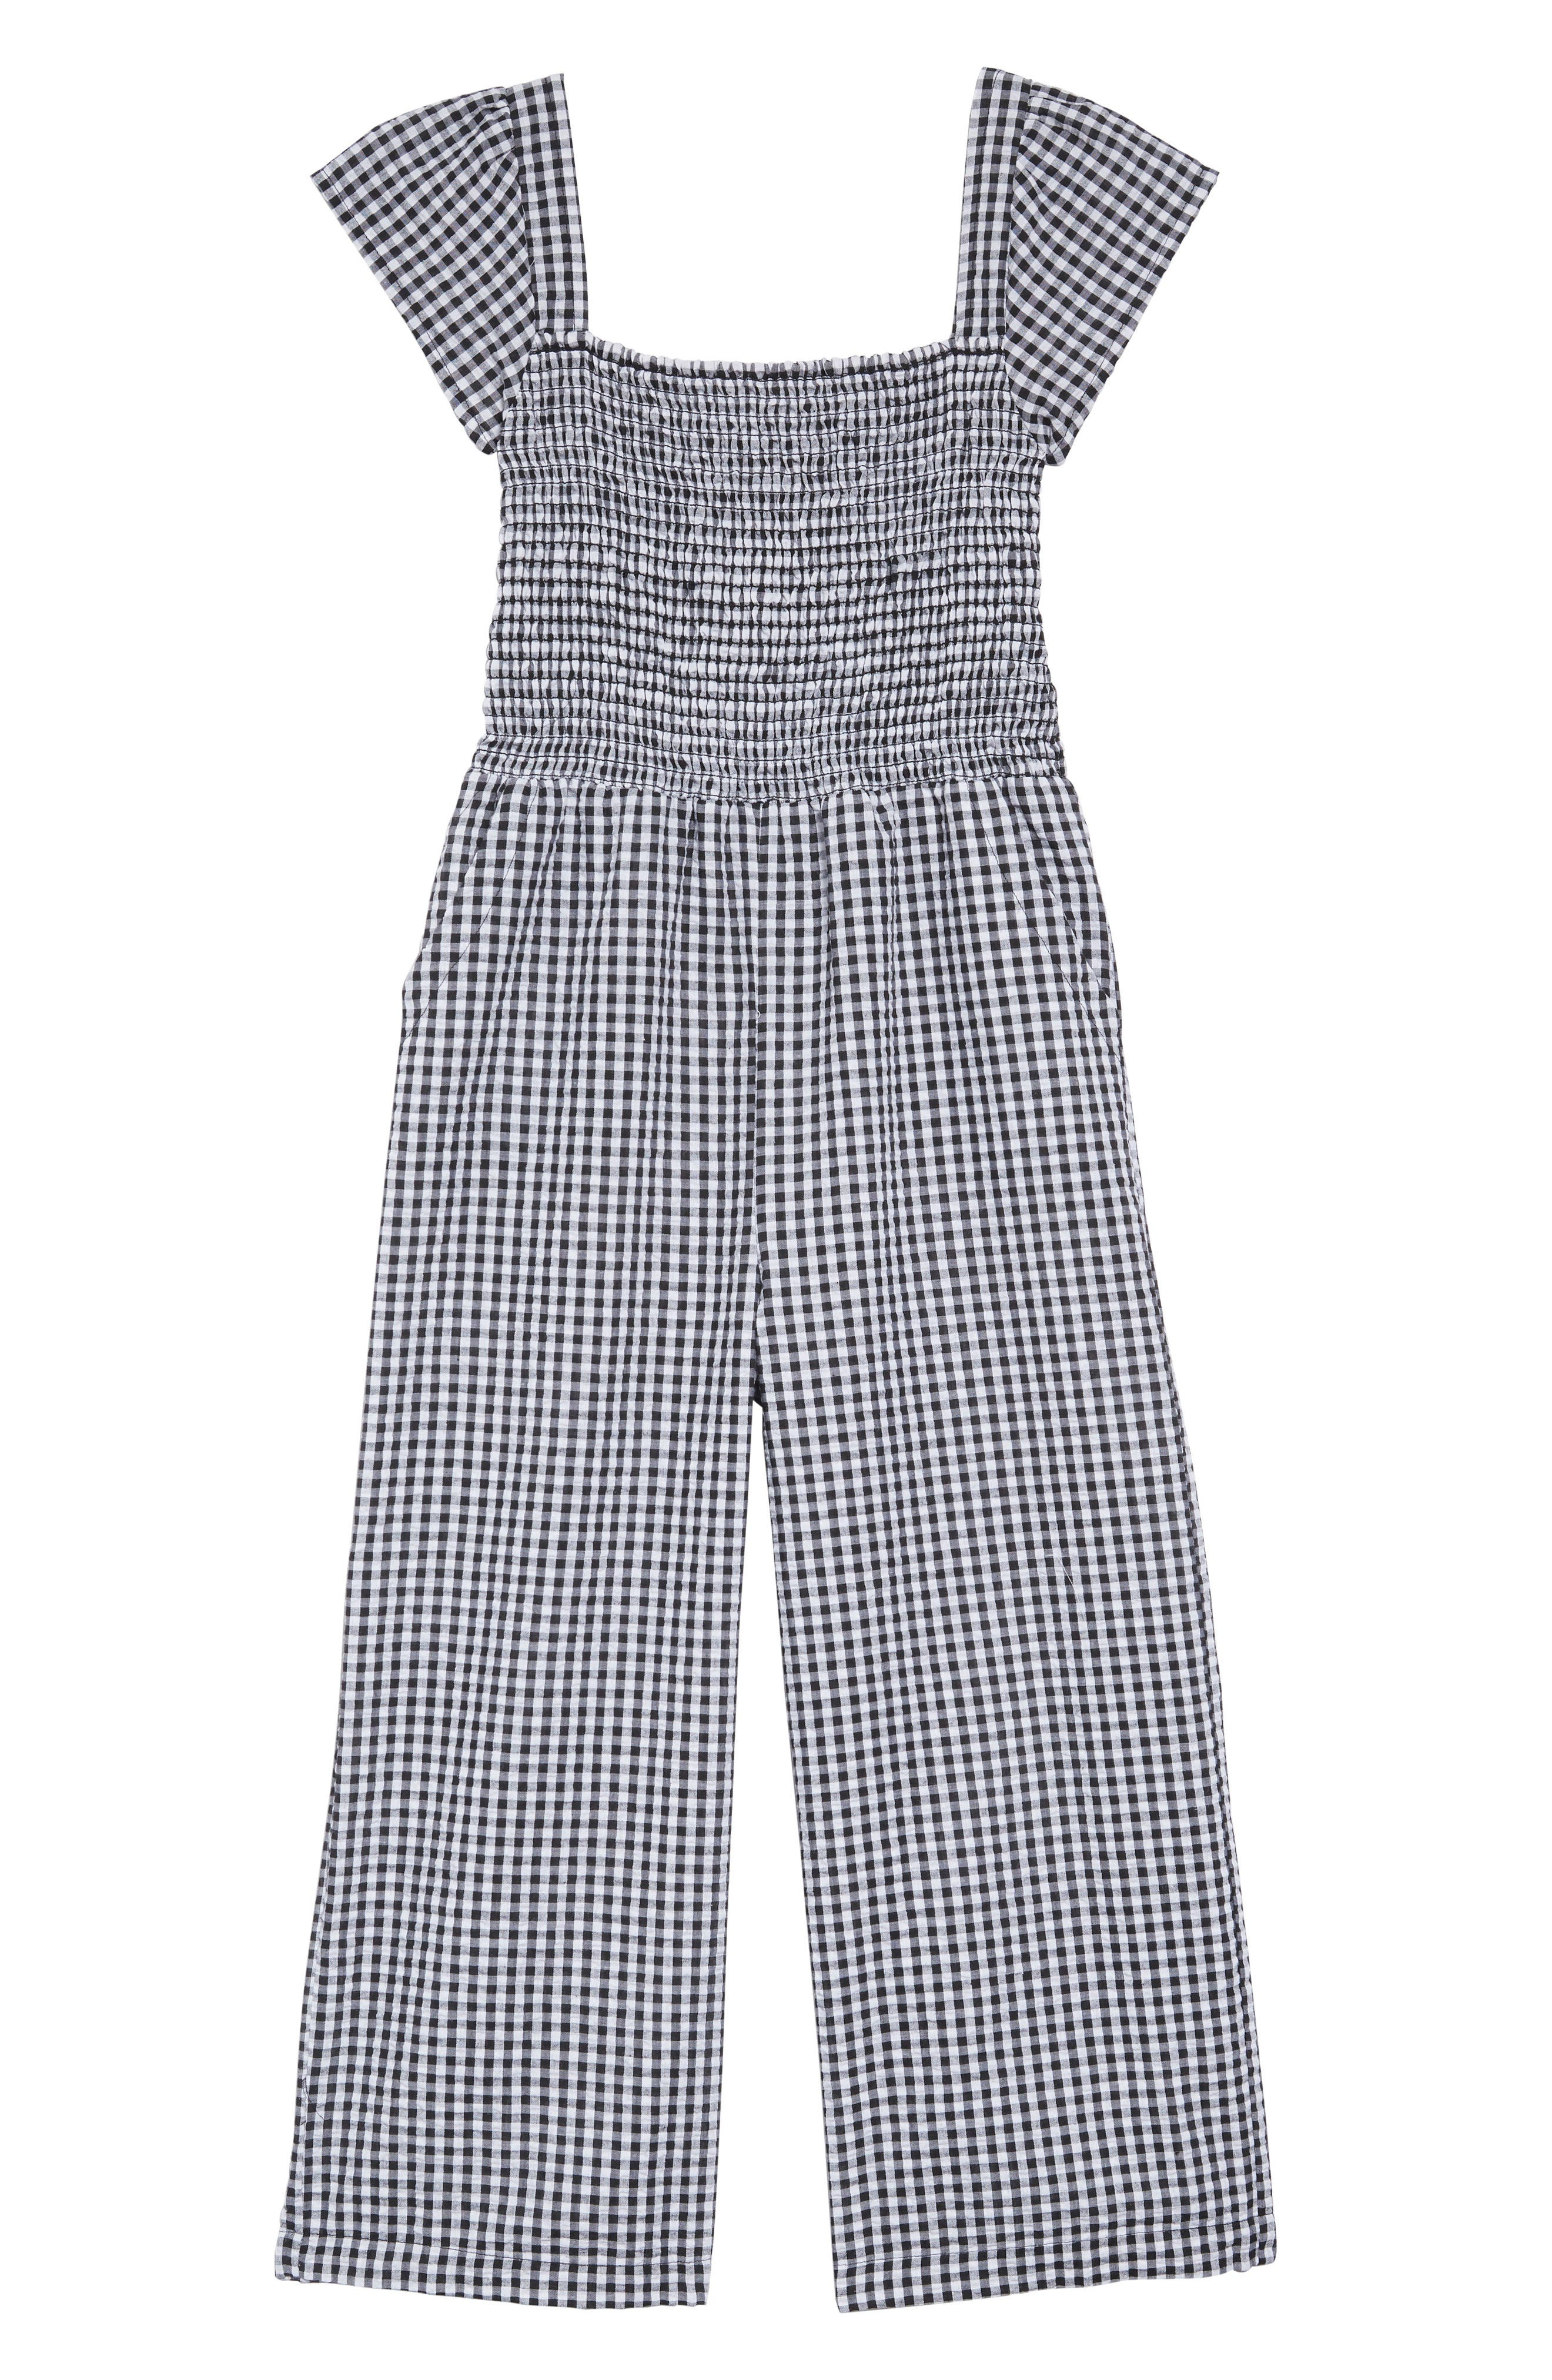 Girls Tucker  Tate Boardwalk Smocked Gingham Jumpsuit Size L (1012)  Black